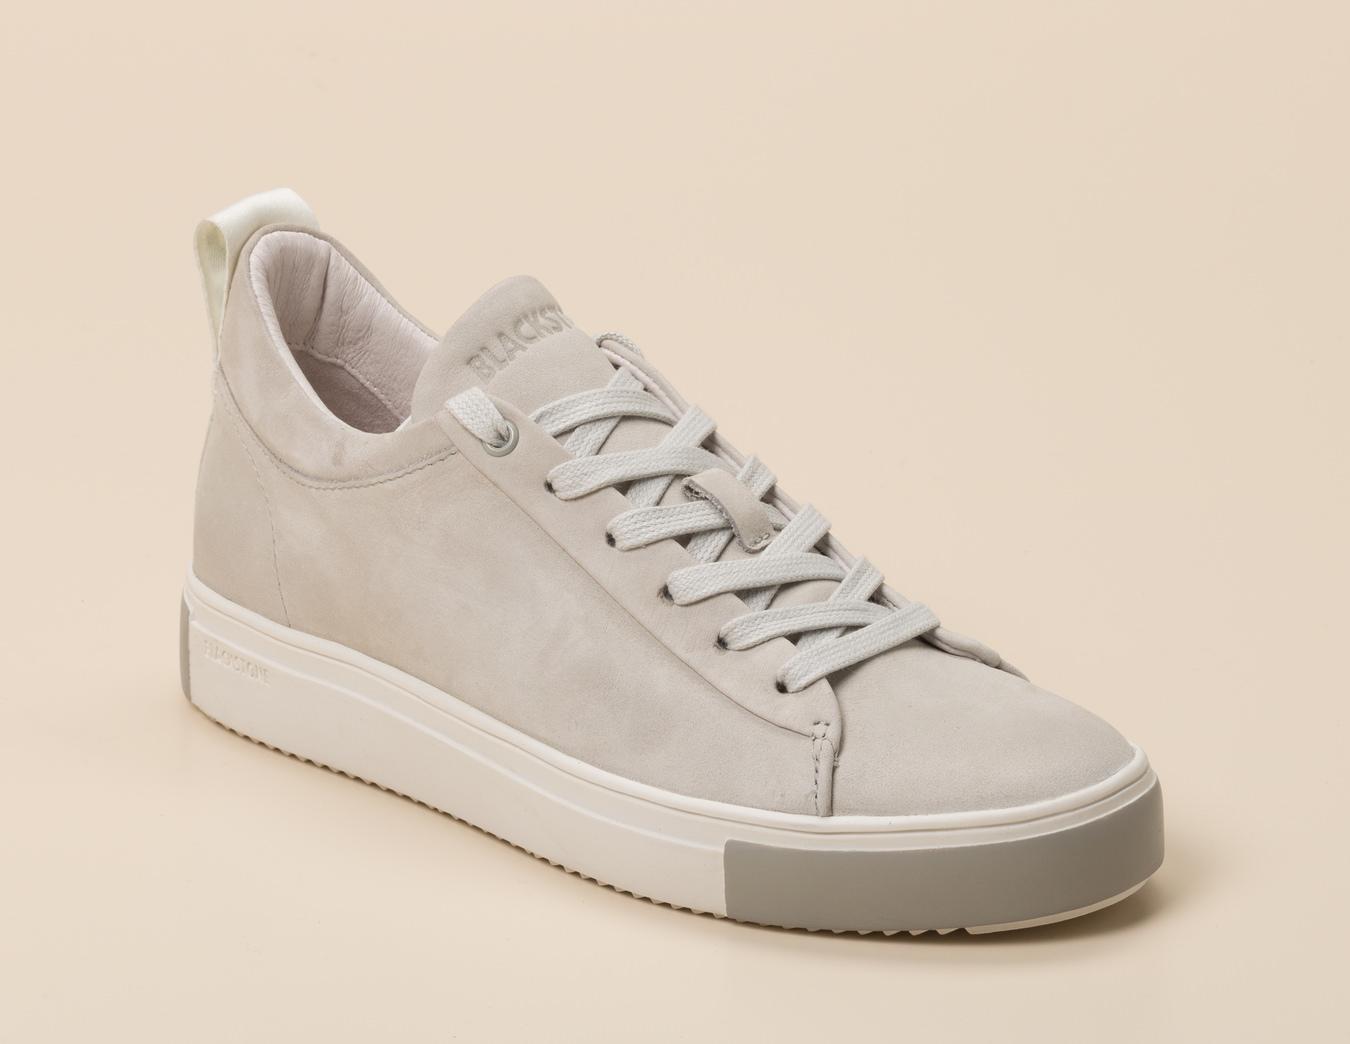 Blackstone Damen Sneaker in hellgrau kaufen   Zumnorde Online Shop